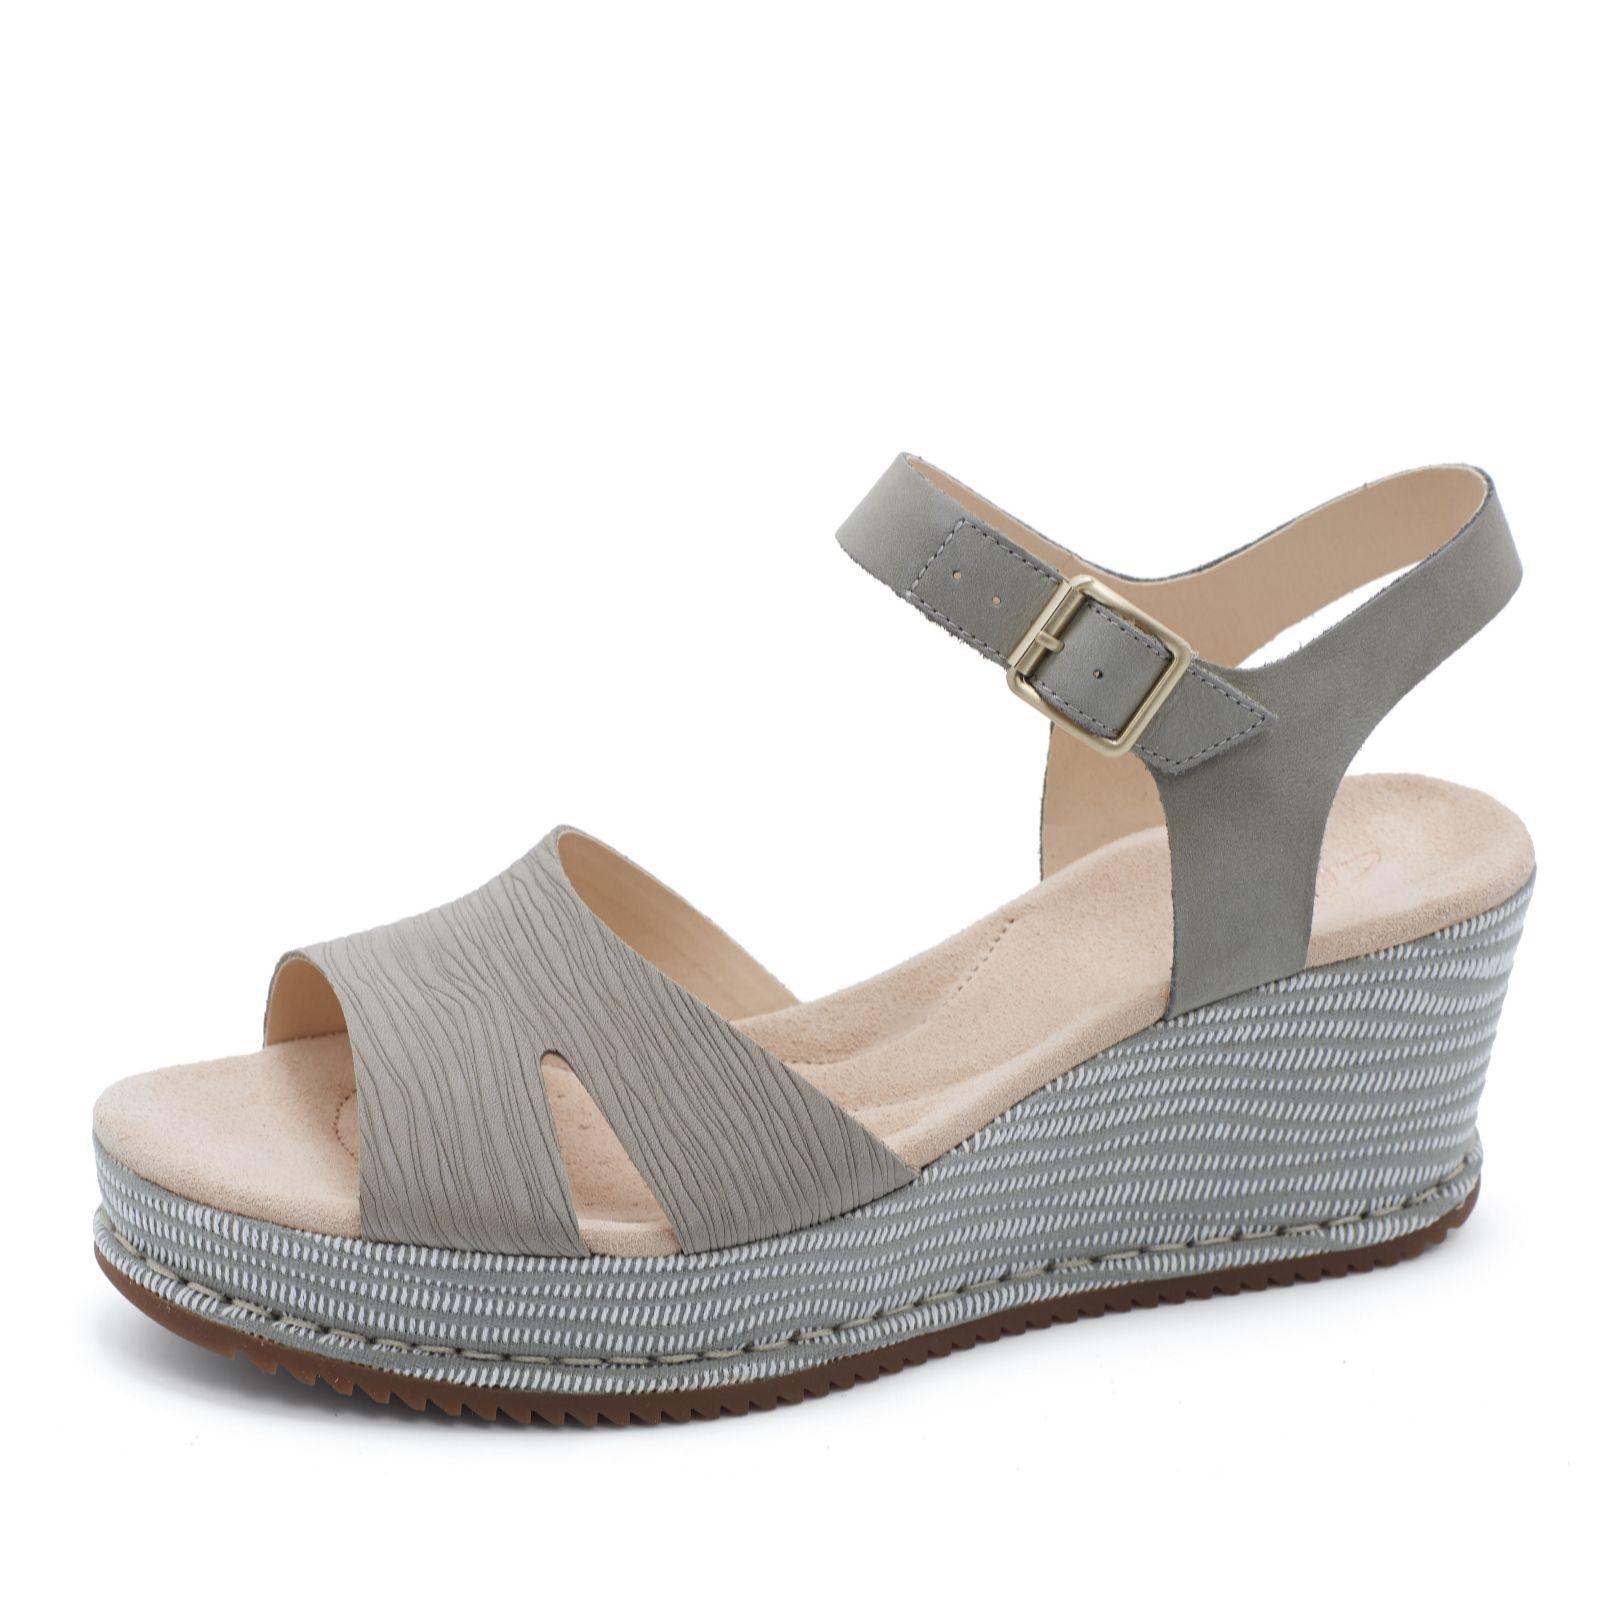 f9123219113 Clarks Akilah Eden Strappy Sandal Standard Fit - QVC UK